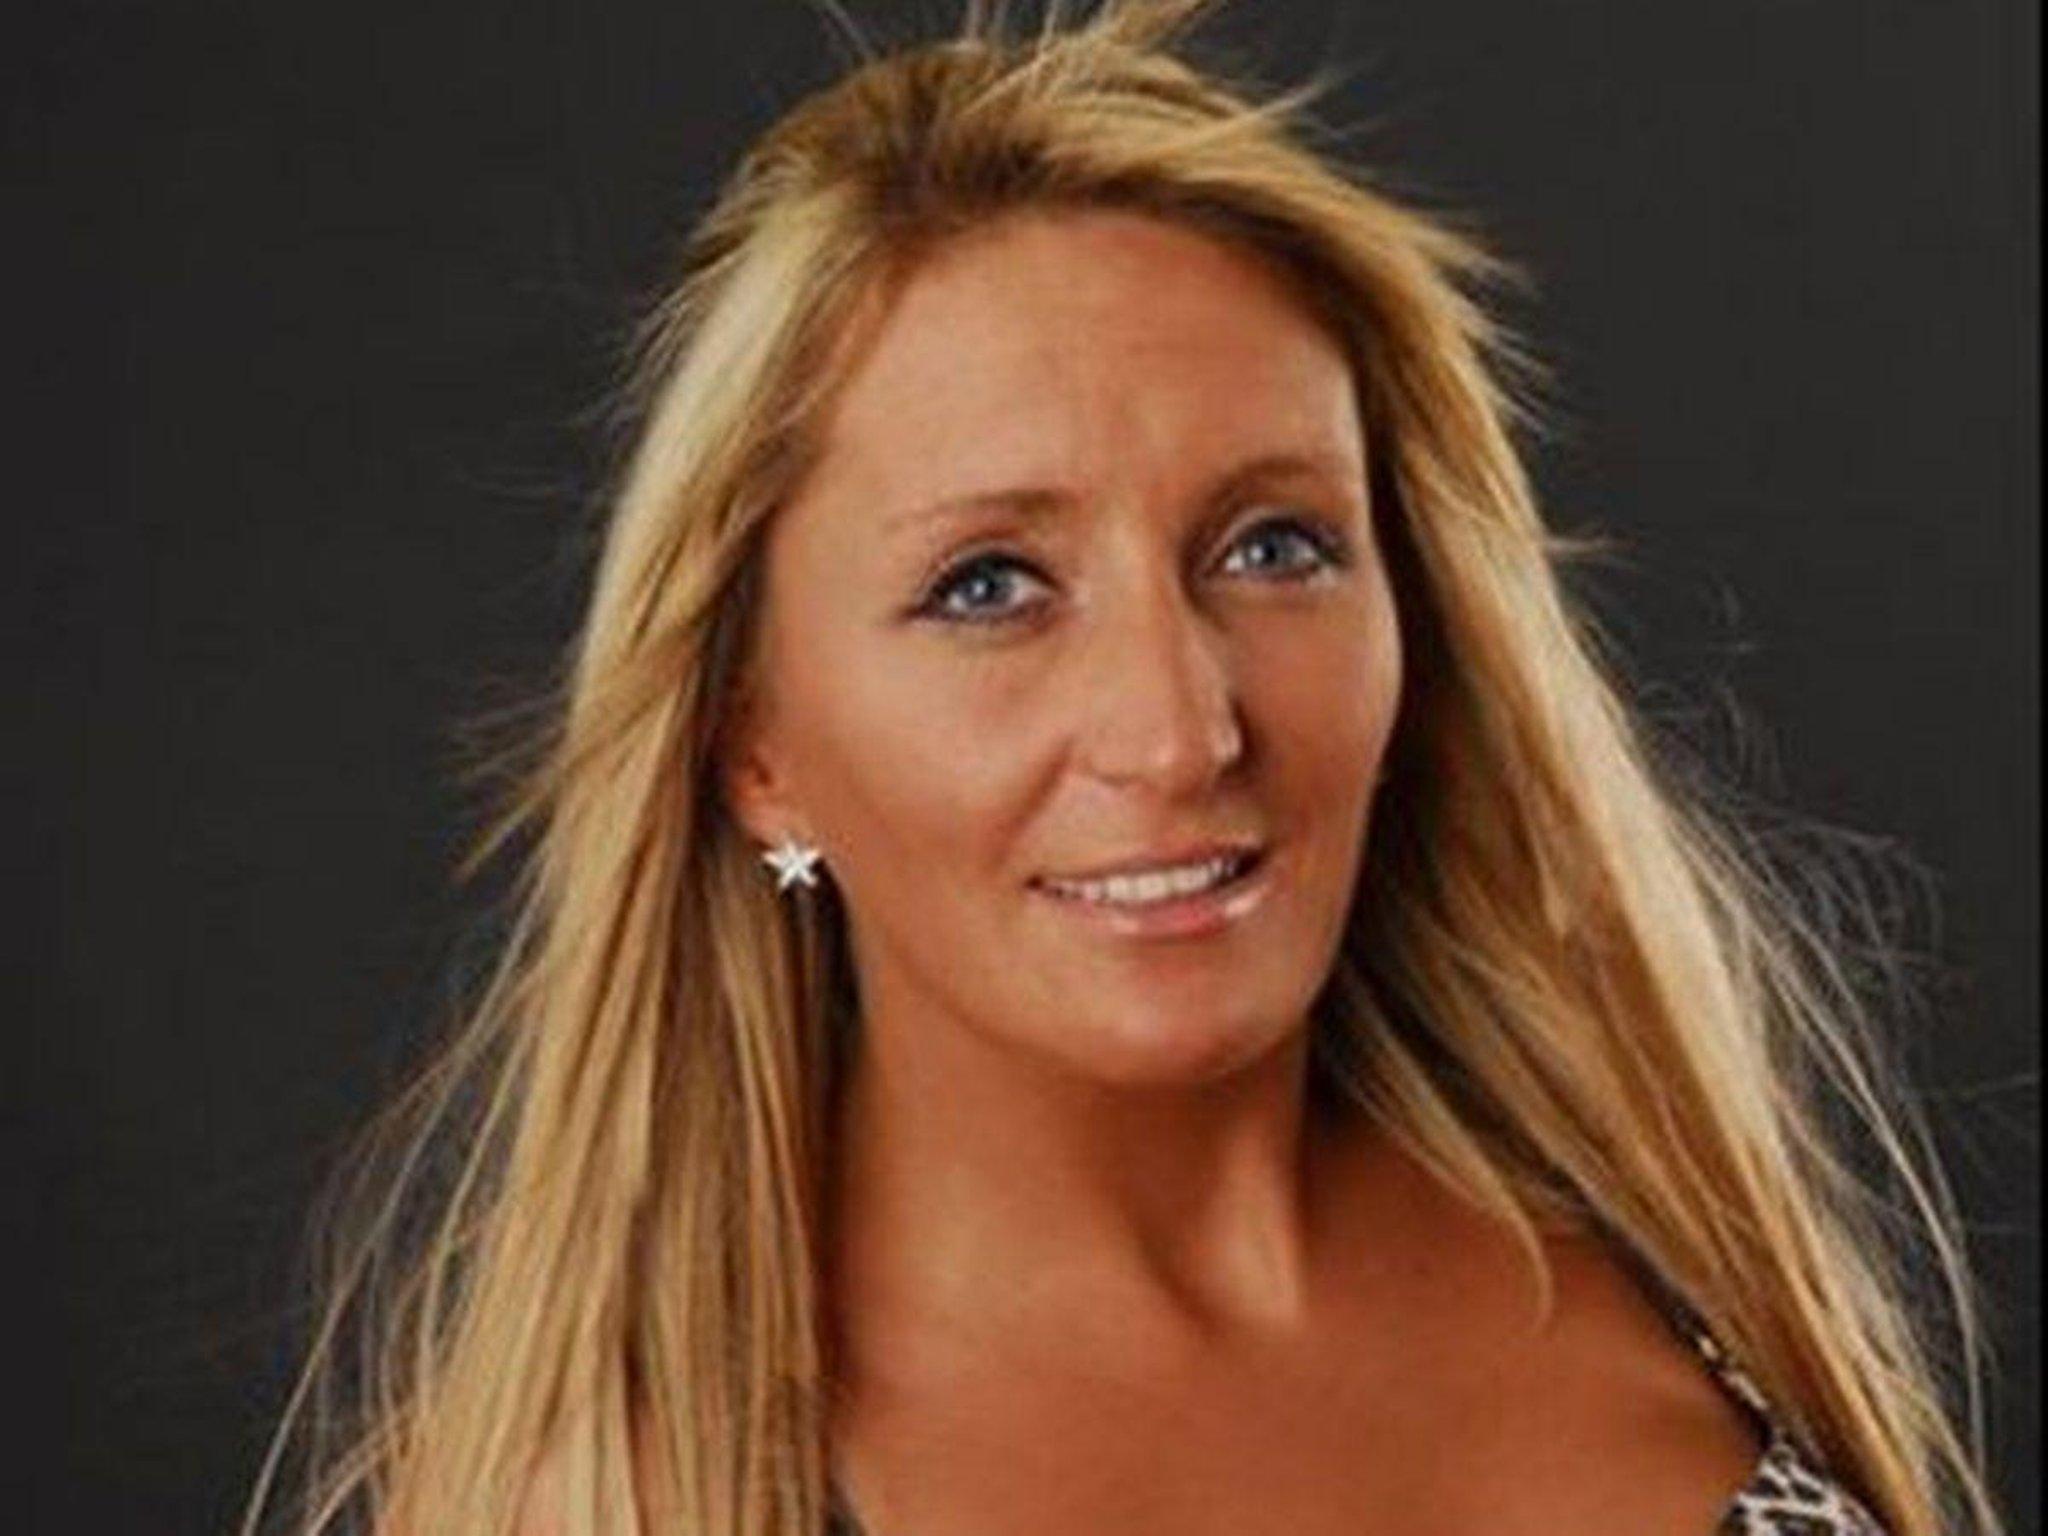 Edinburgh killer model Caroline Igoe caught with SIM card in prison